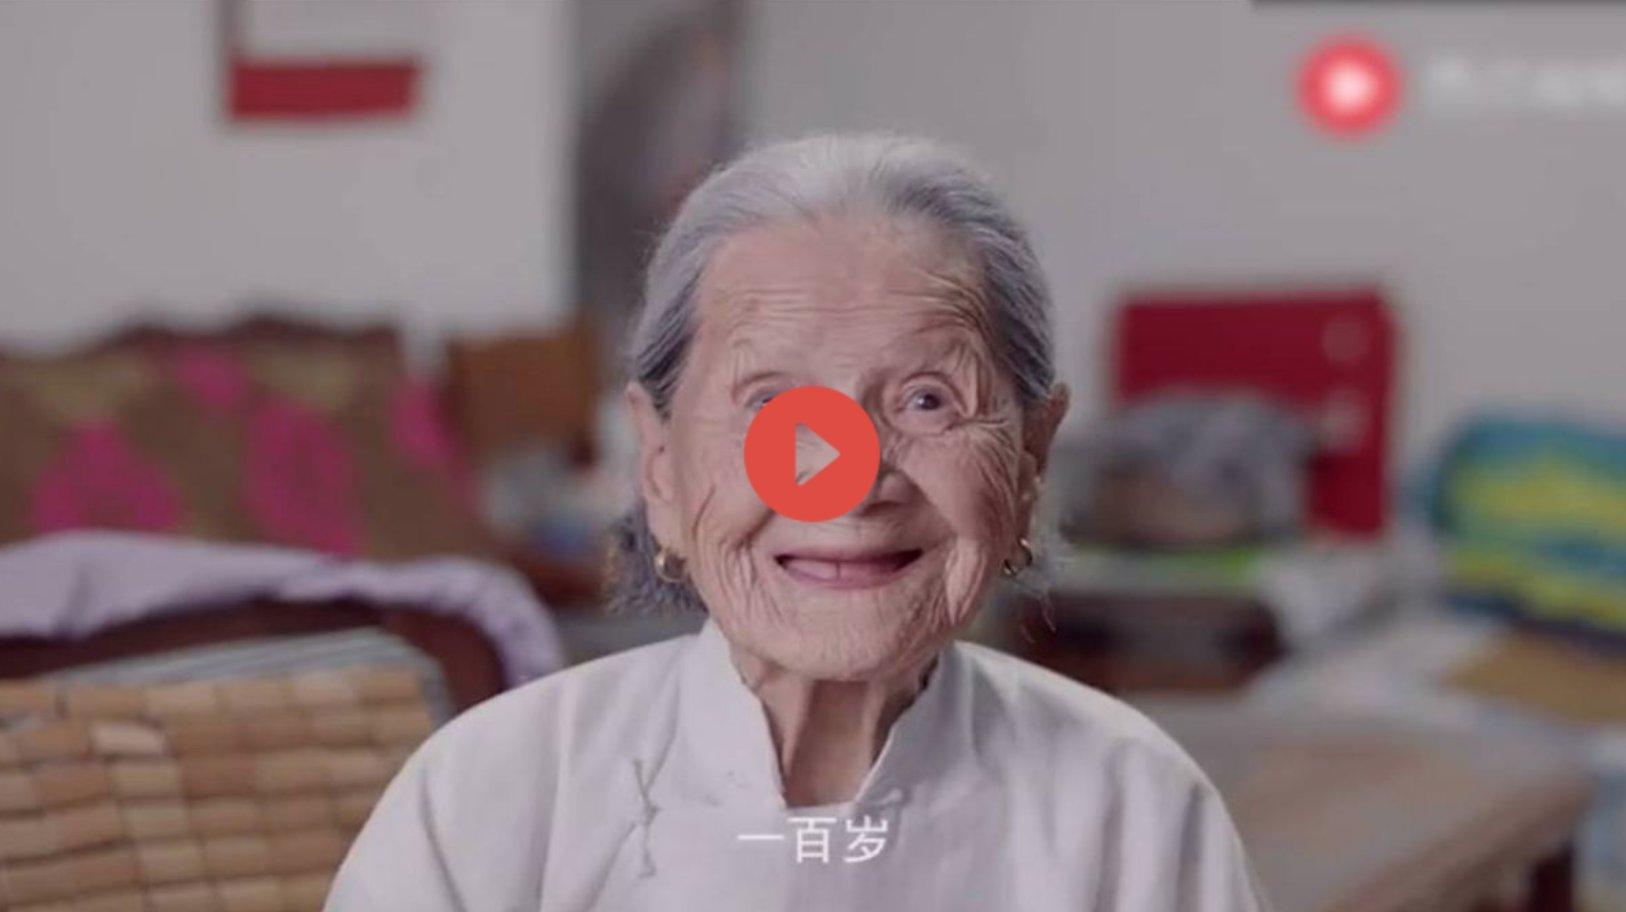 screen shot 2018 10 04 at 3 04 48 pm.png?resize=300,169 - 120秒紀錄女性1-100歲變化...網友鼻酸感嘆:「這就是人生啊~」